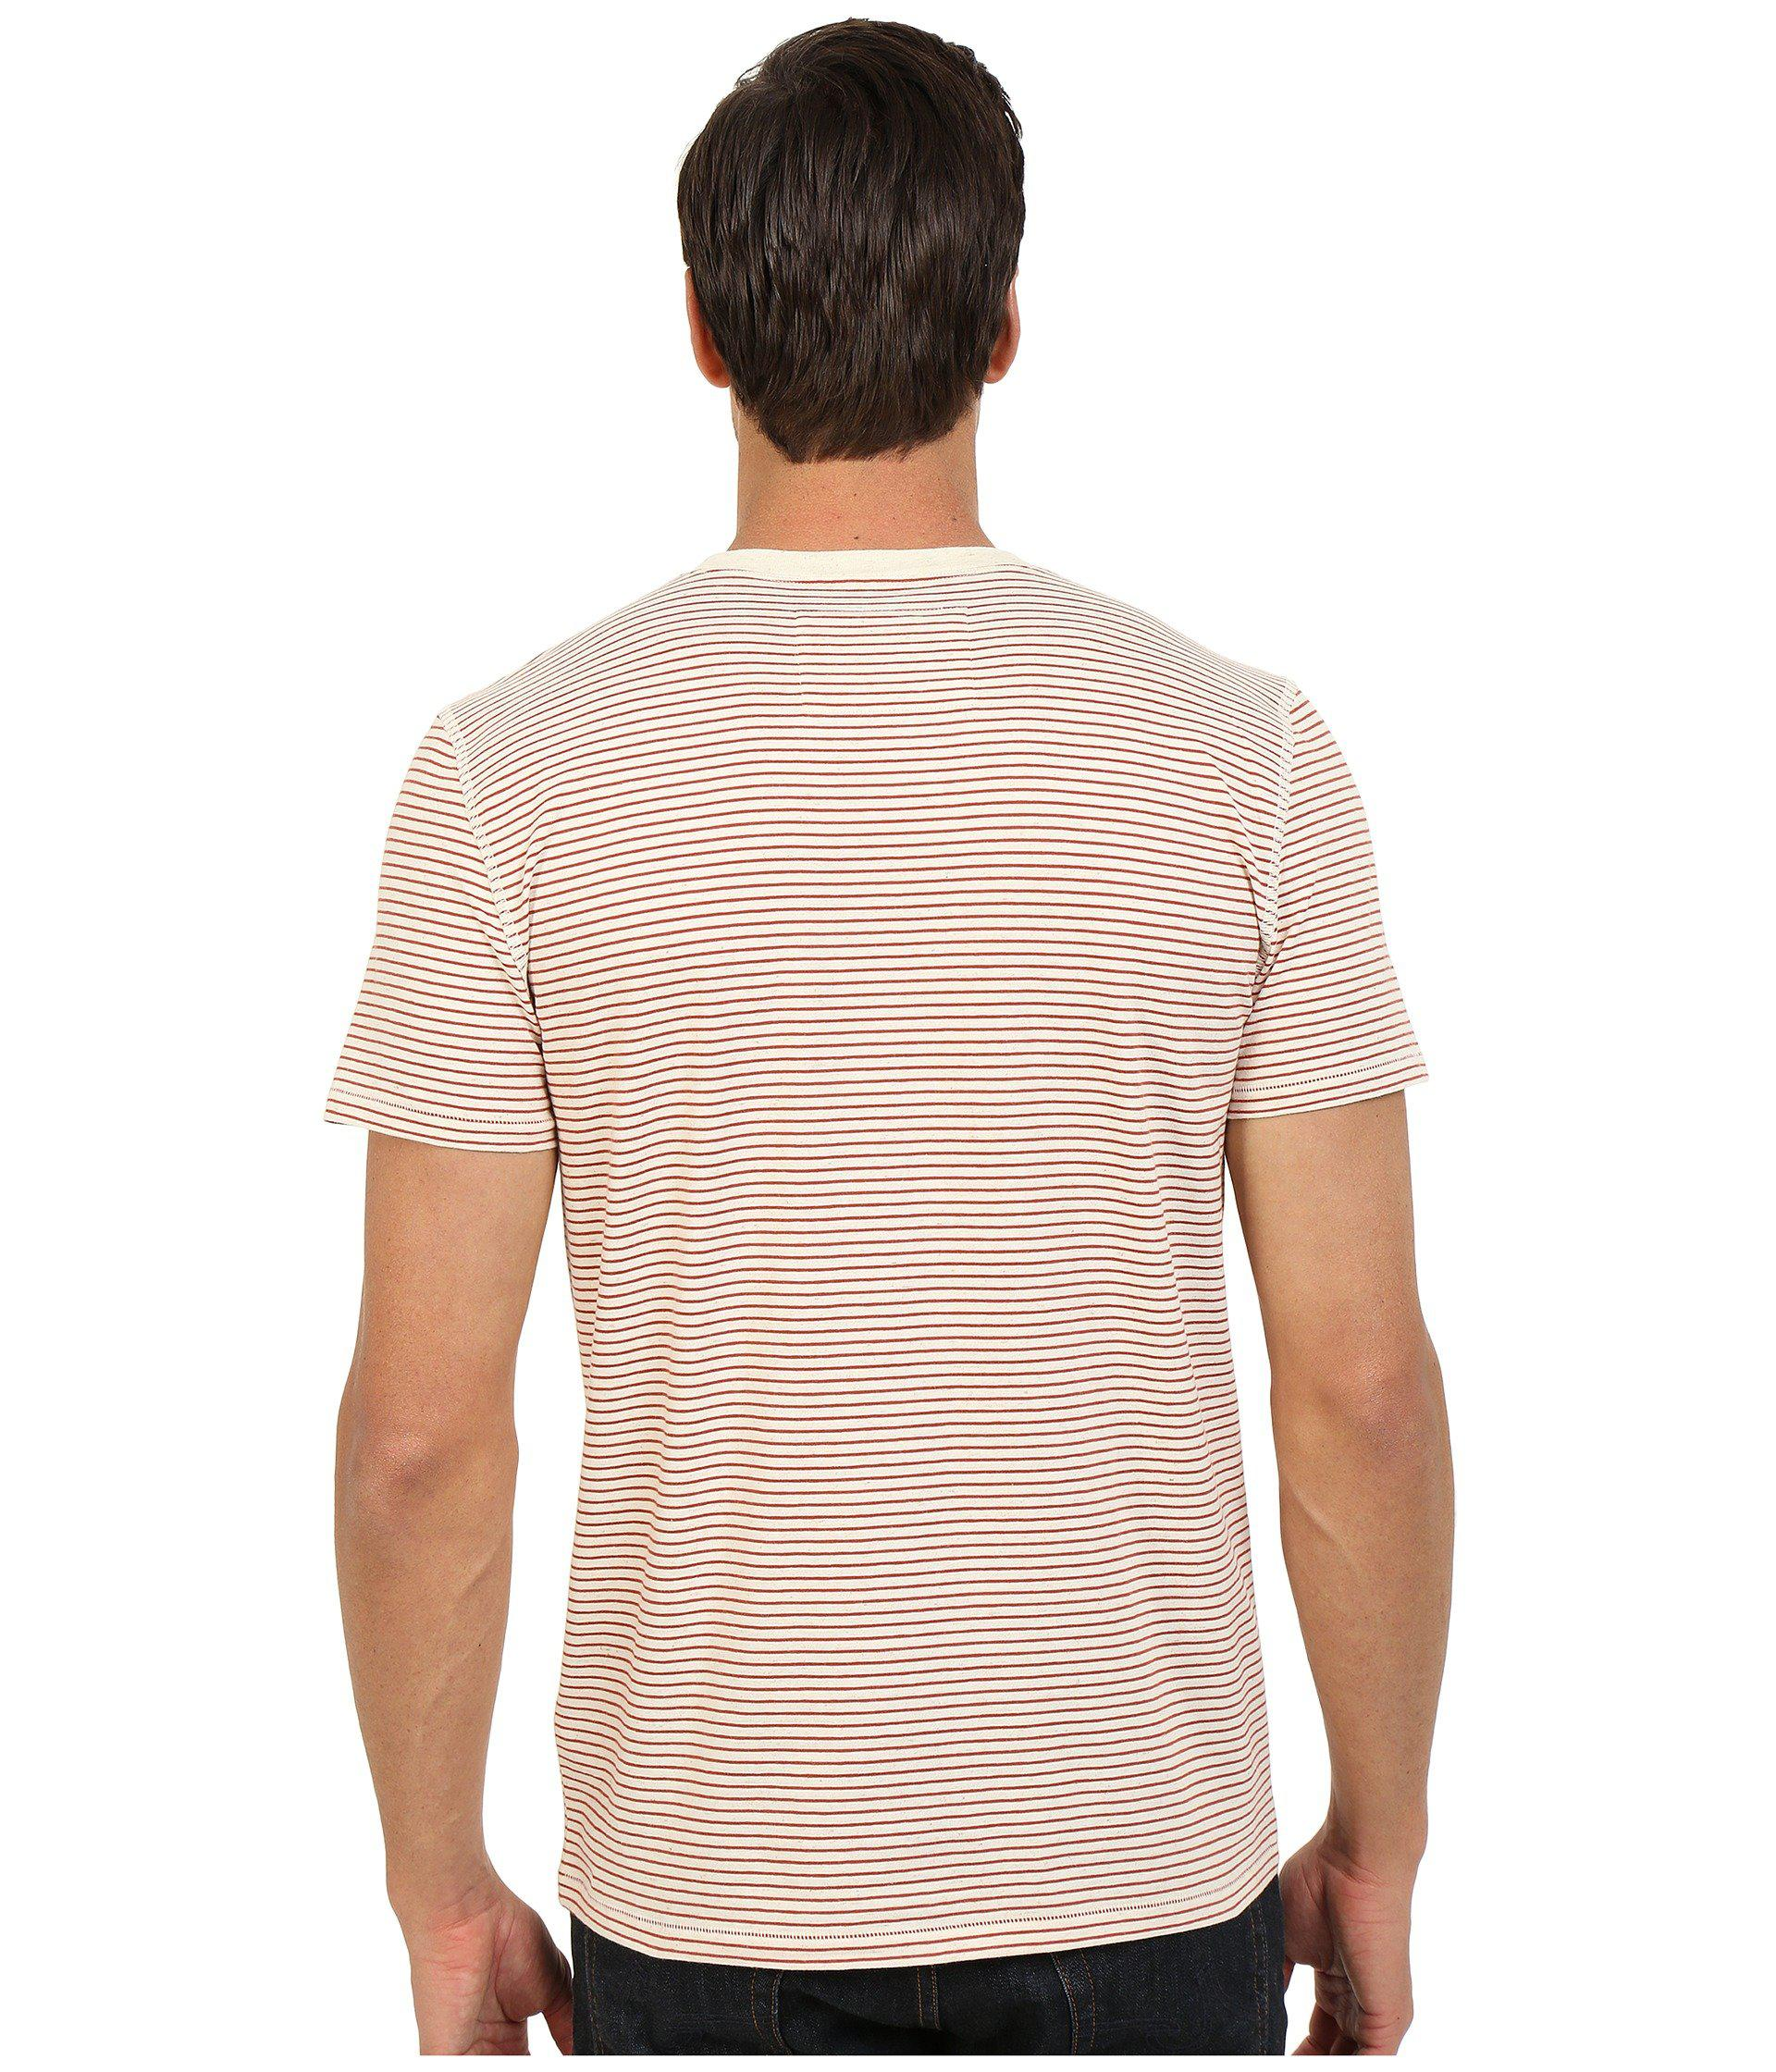 0a27594882 7 For All Mankind Short Sleeve Stripe Ringer Tee for Men - Lyst